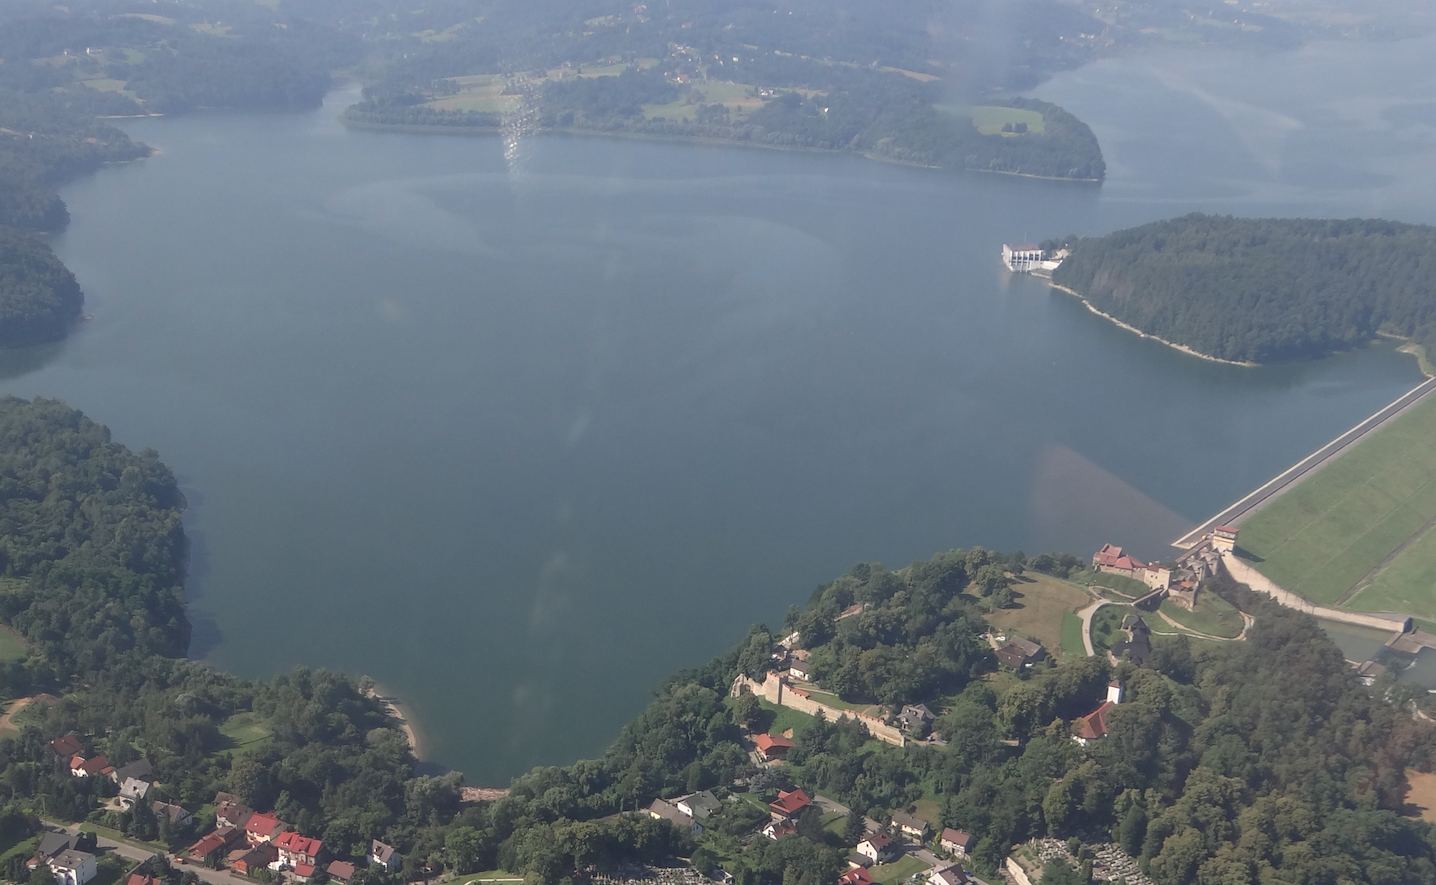 The Lagoon in Dobczyce. 2020 year. Photo by Karol Placha Hetman